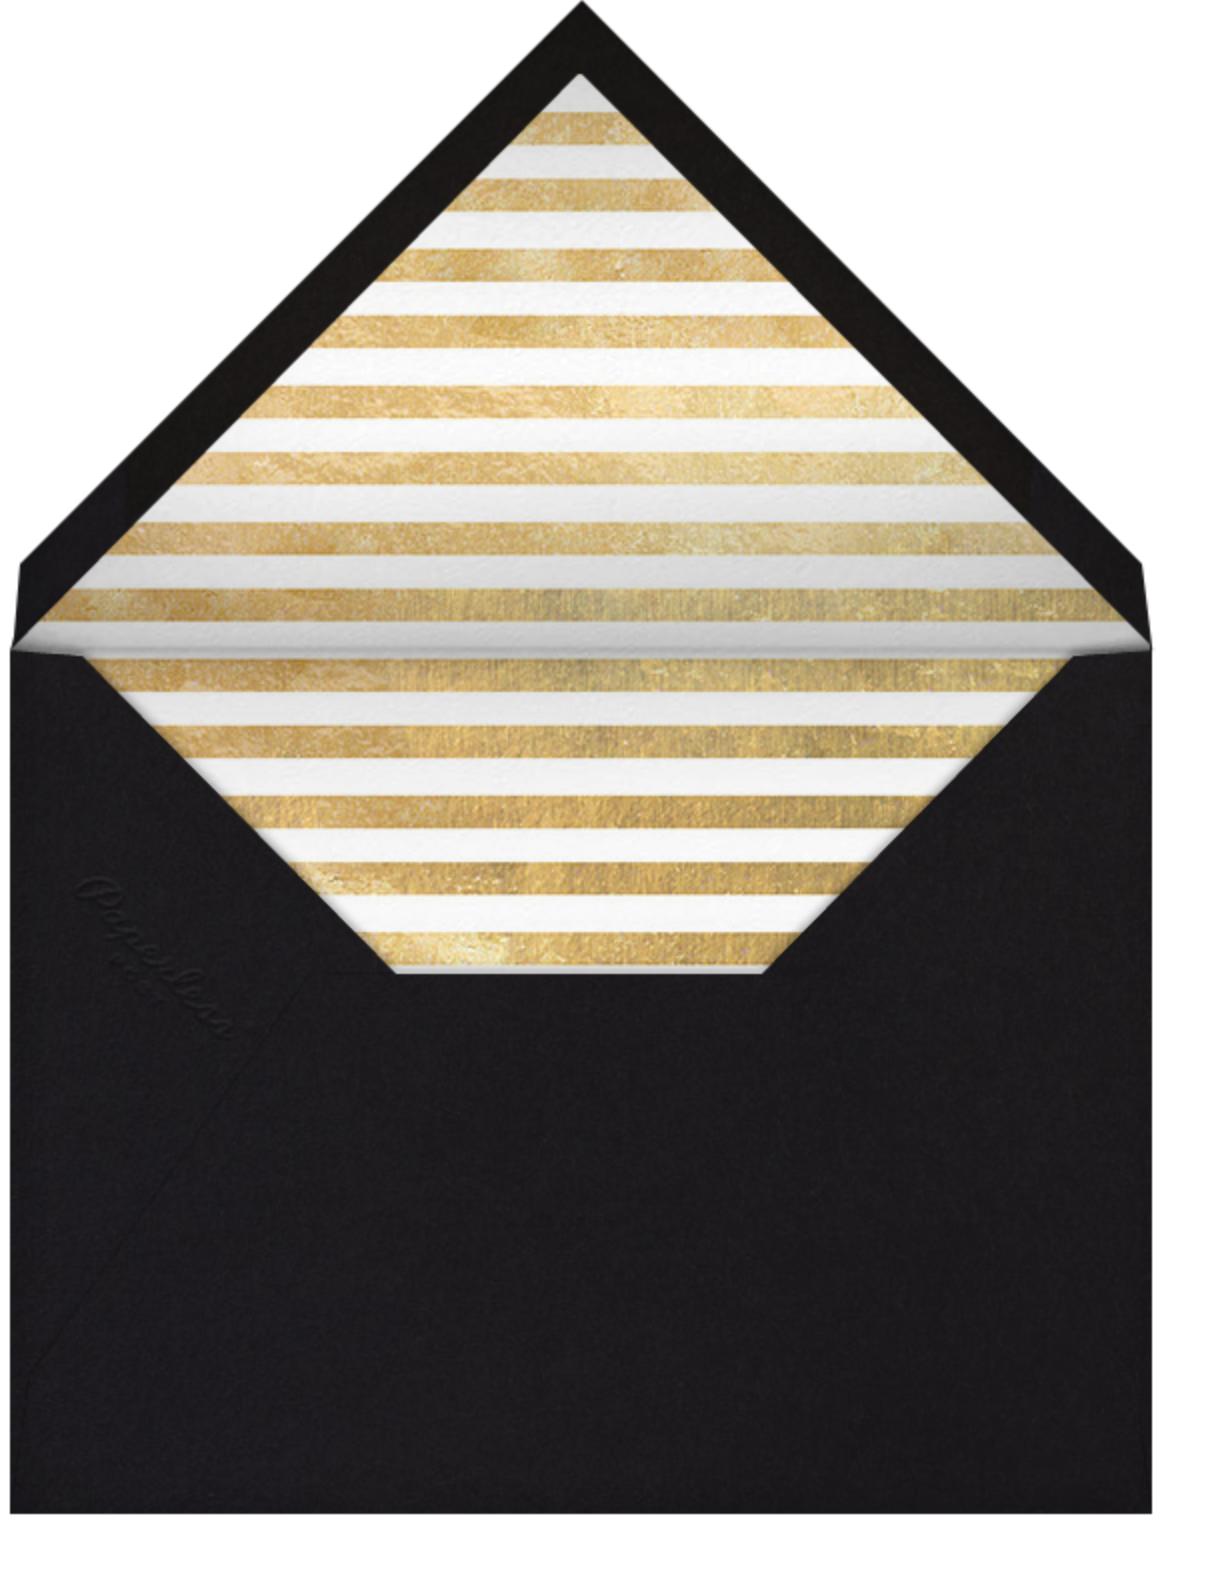 Balloon Birthday (Photo) - Gold - kate spade new york - Designs we love - envelope back